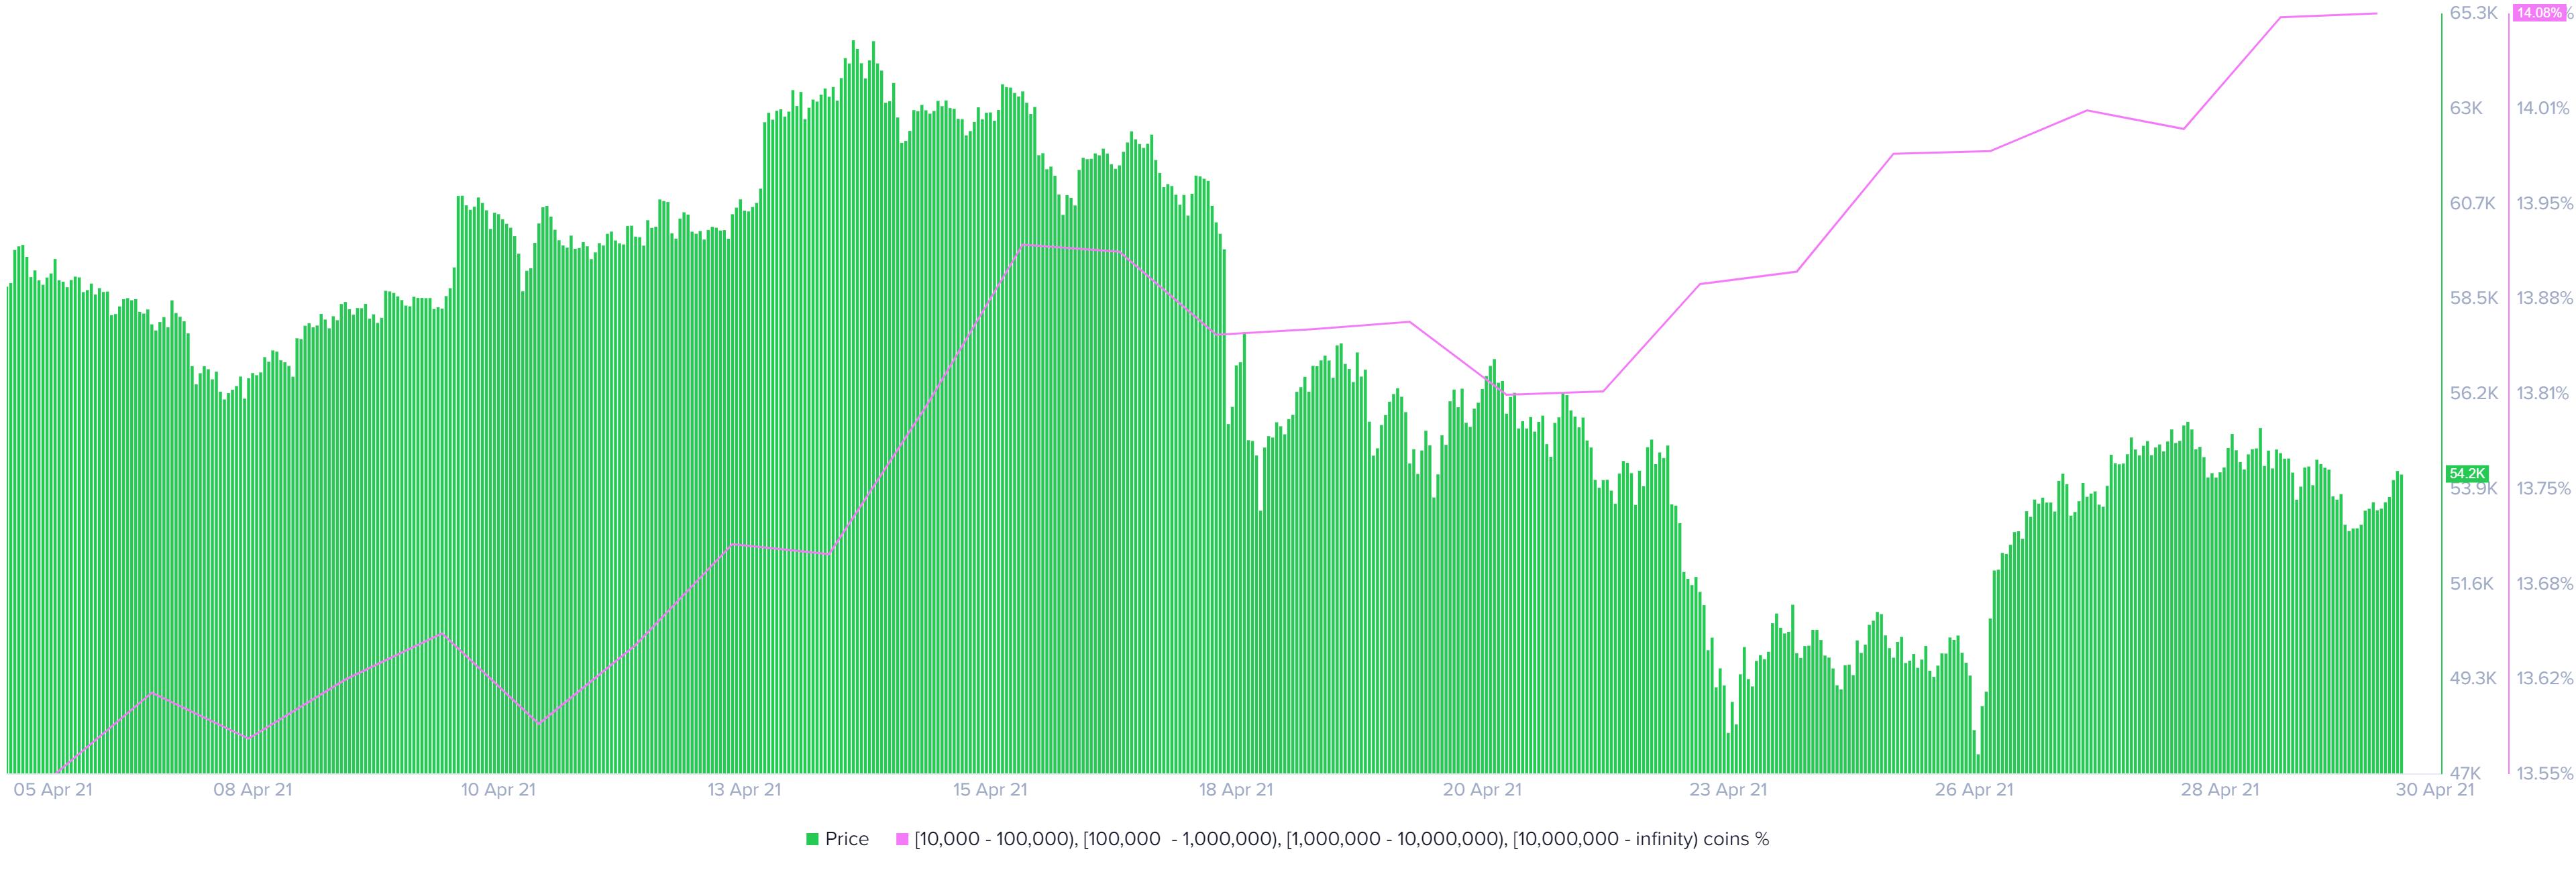 BTC supply distribution chart